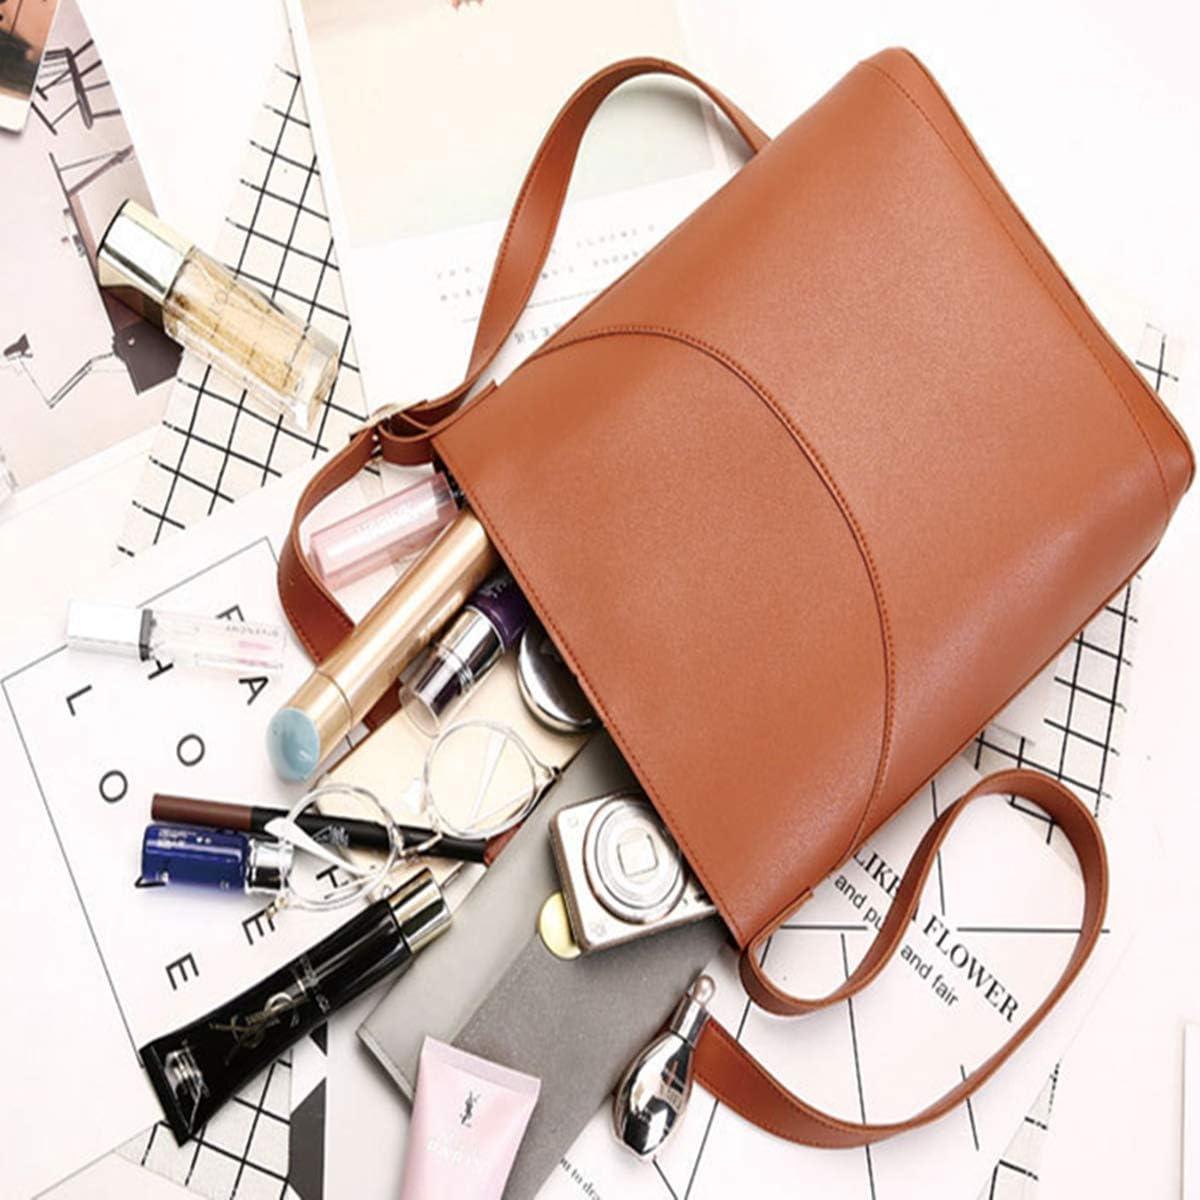 AnneBella Lady Pu Leather Elegant Stachel Bag Crossbody with Adjustable Strap